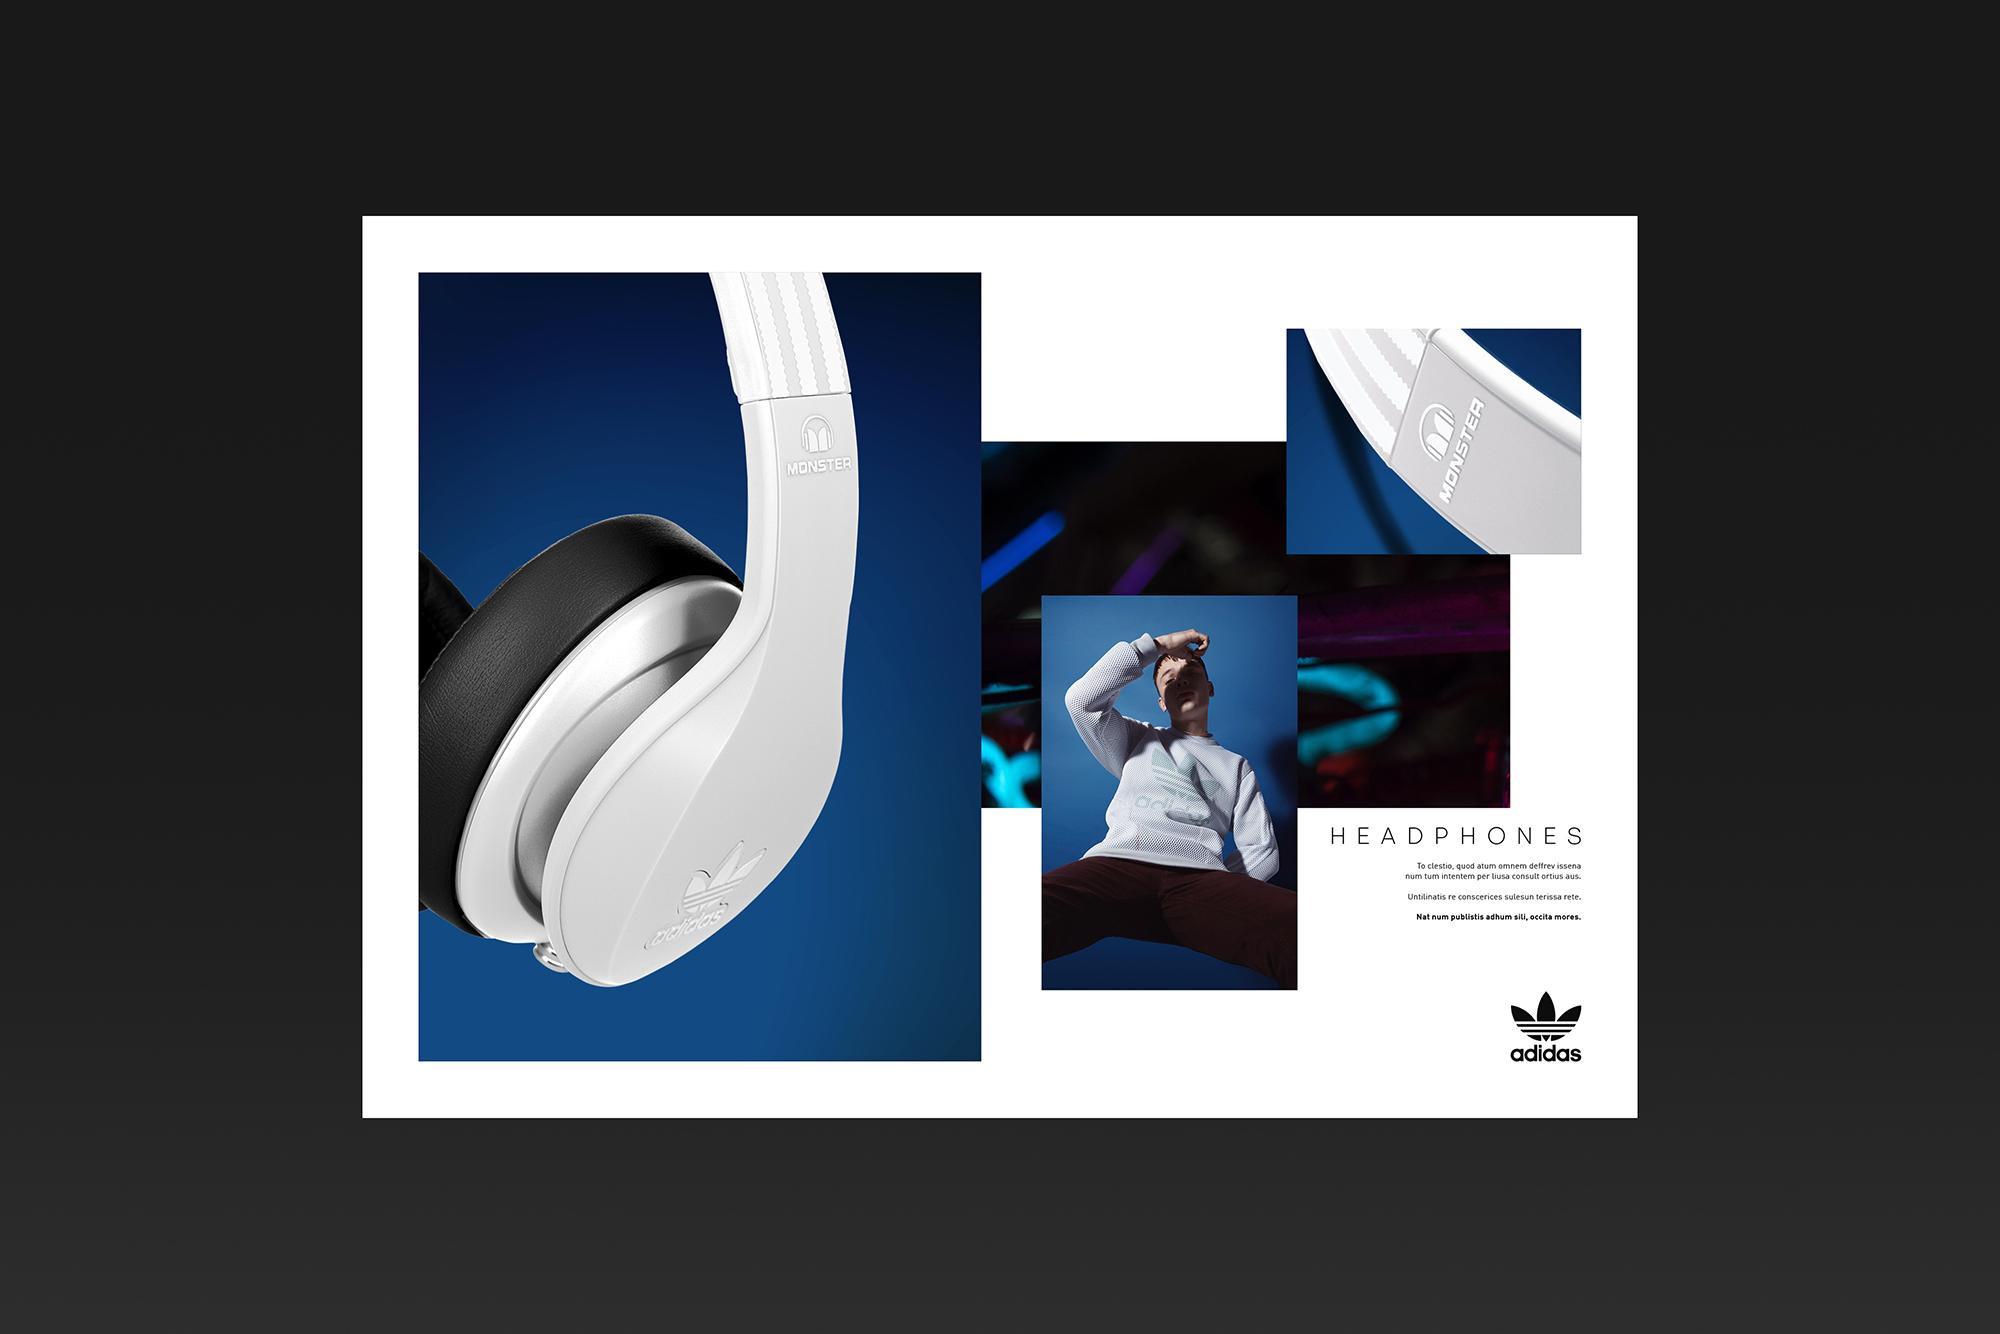 Adidas_SS16_Examples_06.jpg